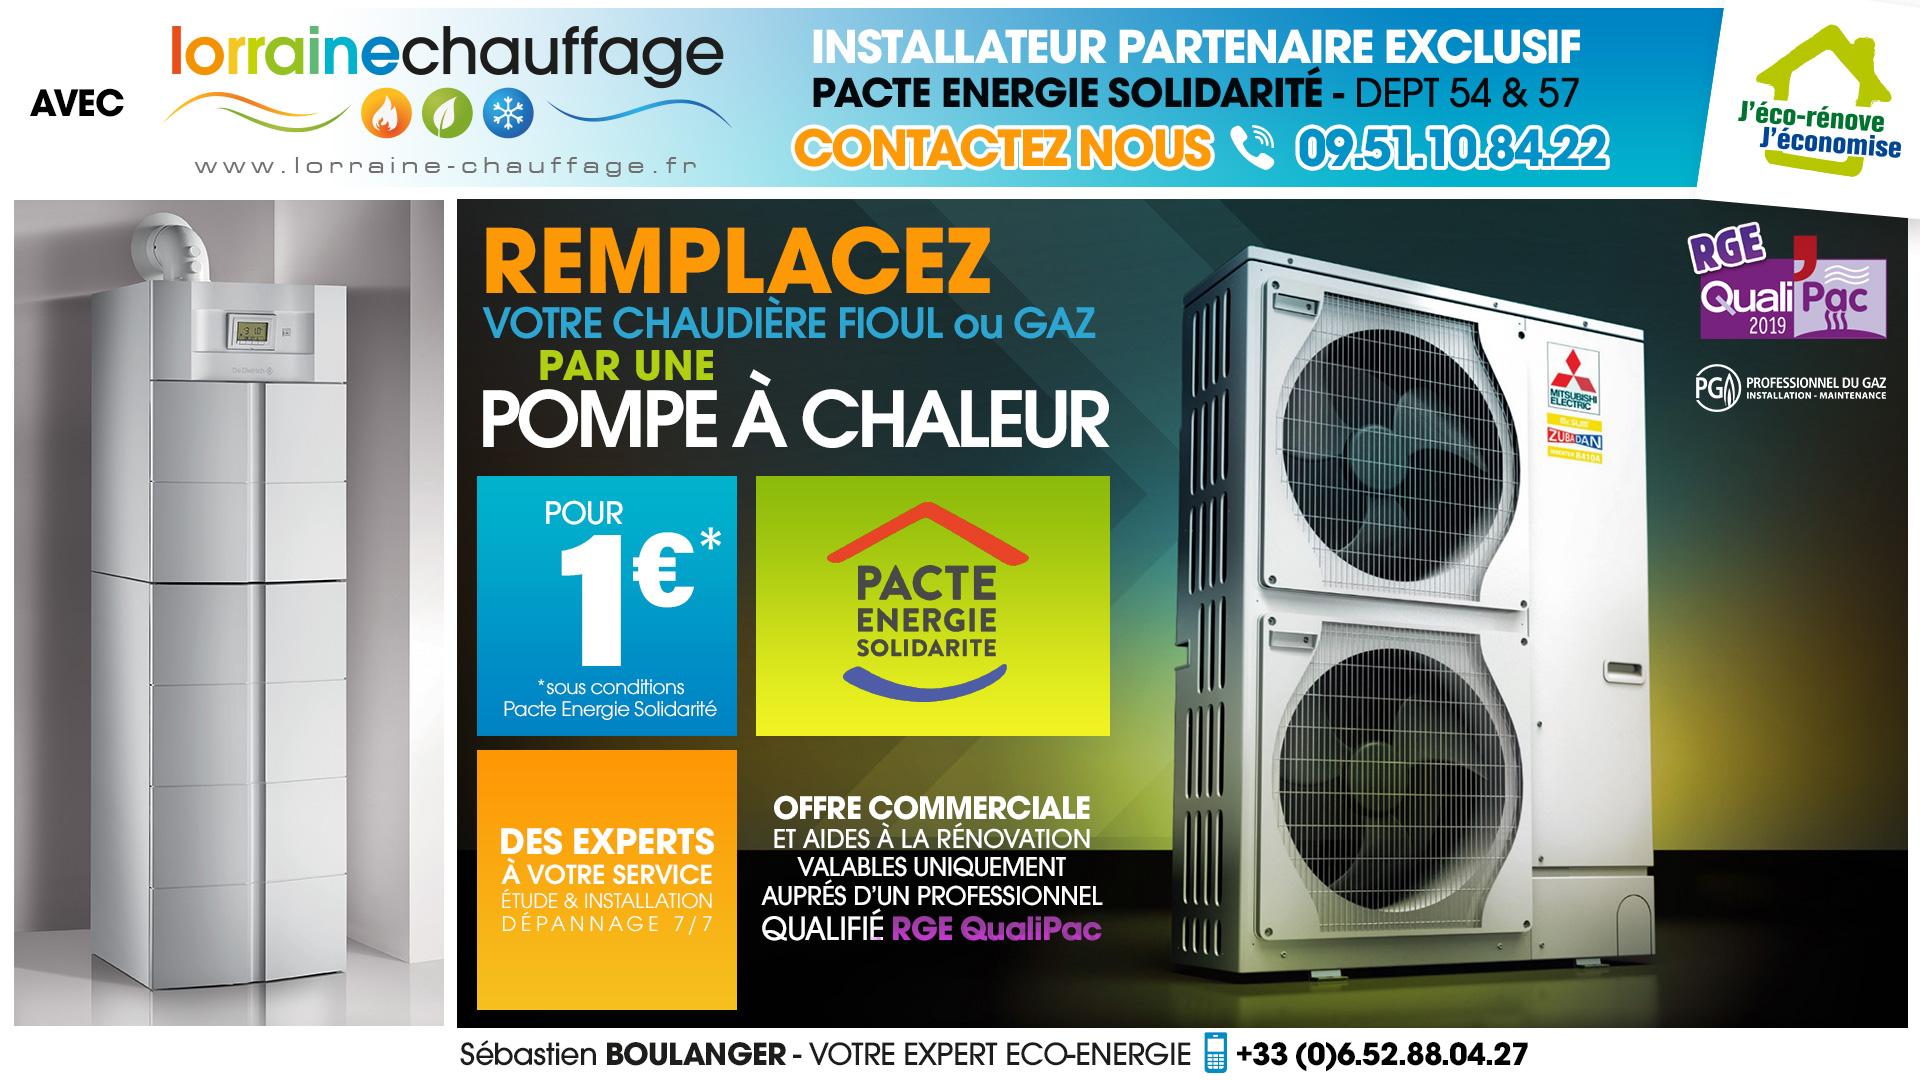 Installation Pompes-à-chaleur-à-1€ Lorraine-Chauffage Metz-Nancy